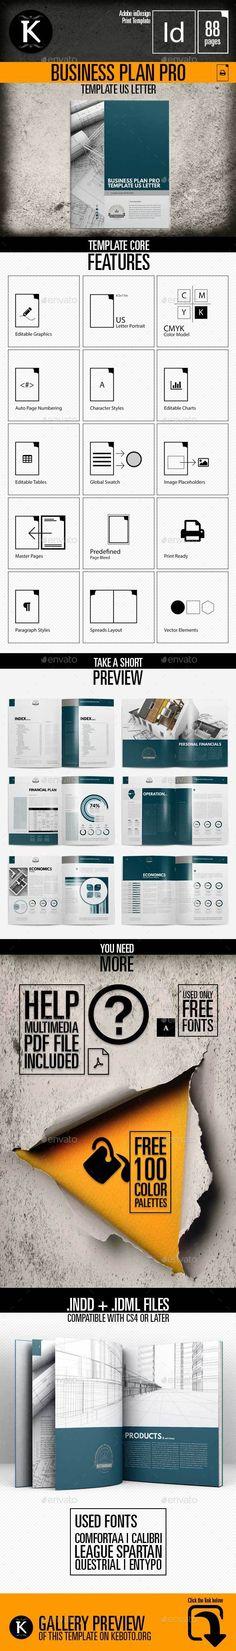 Web Design e-Proposal Template Design templates, Web design and